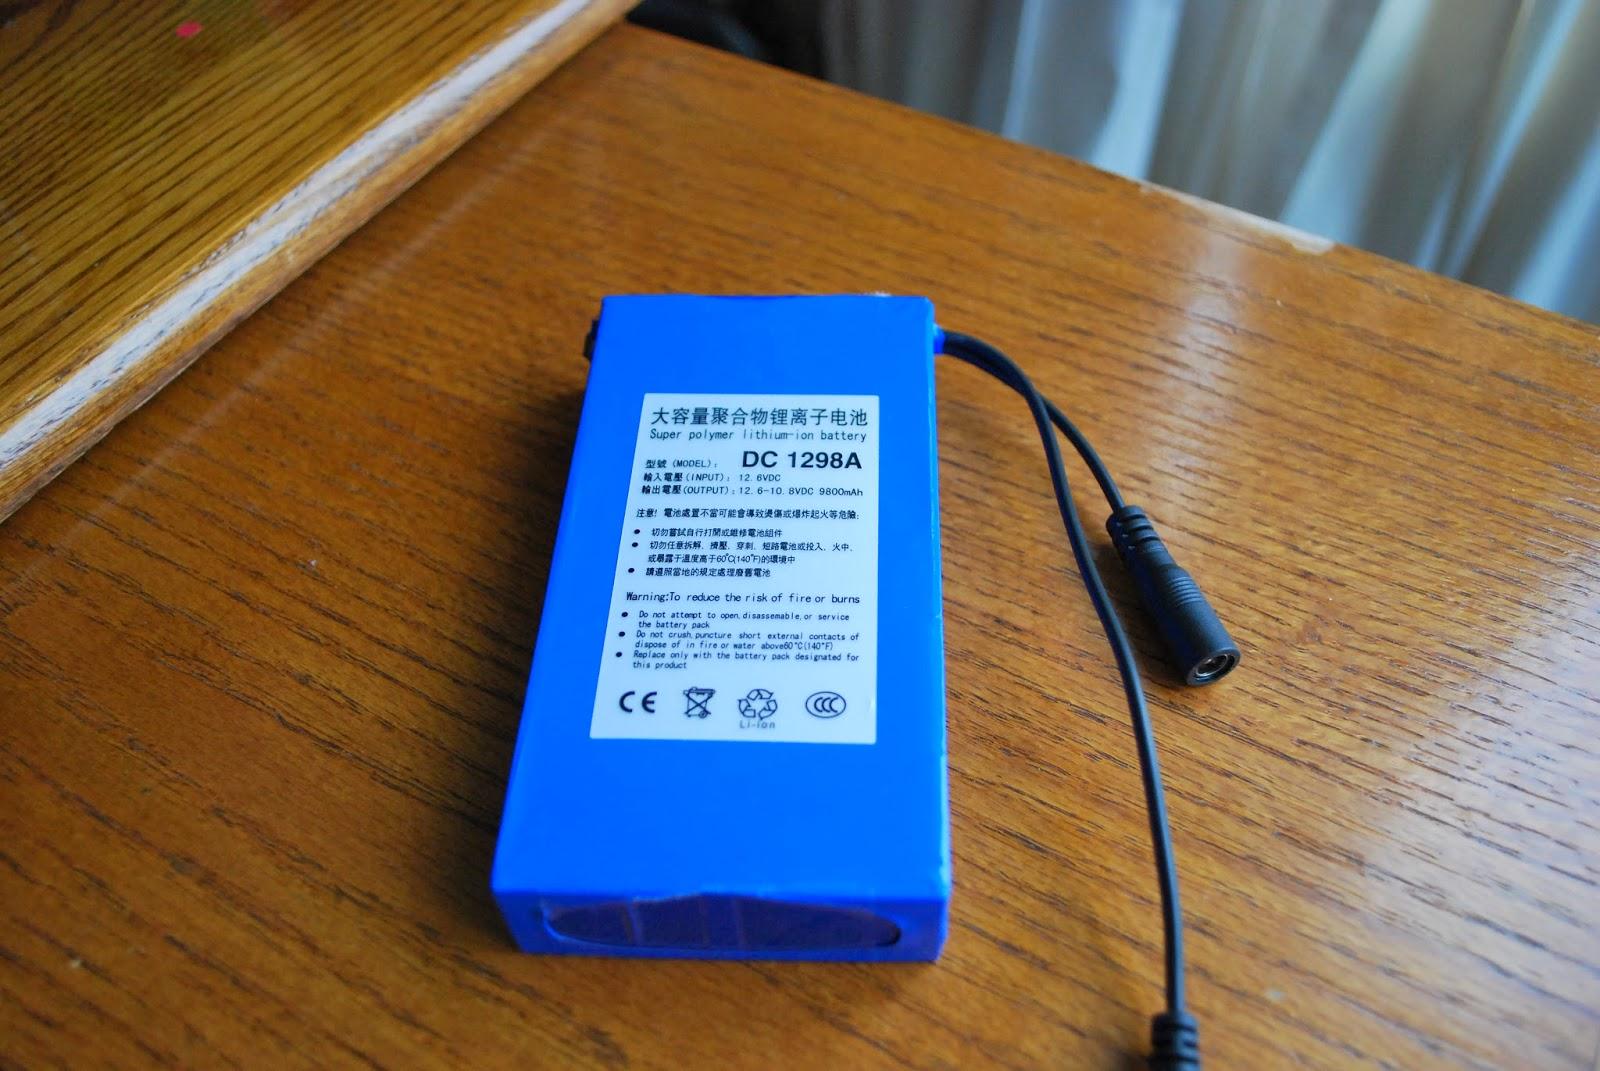 VE9KK QRPower BLOG: In the market for an external battery